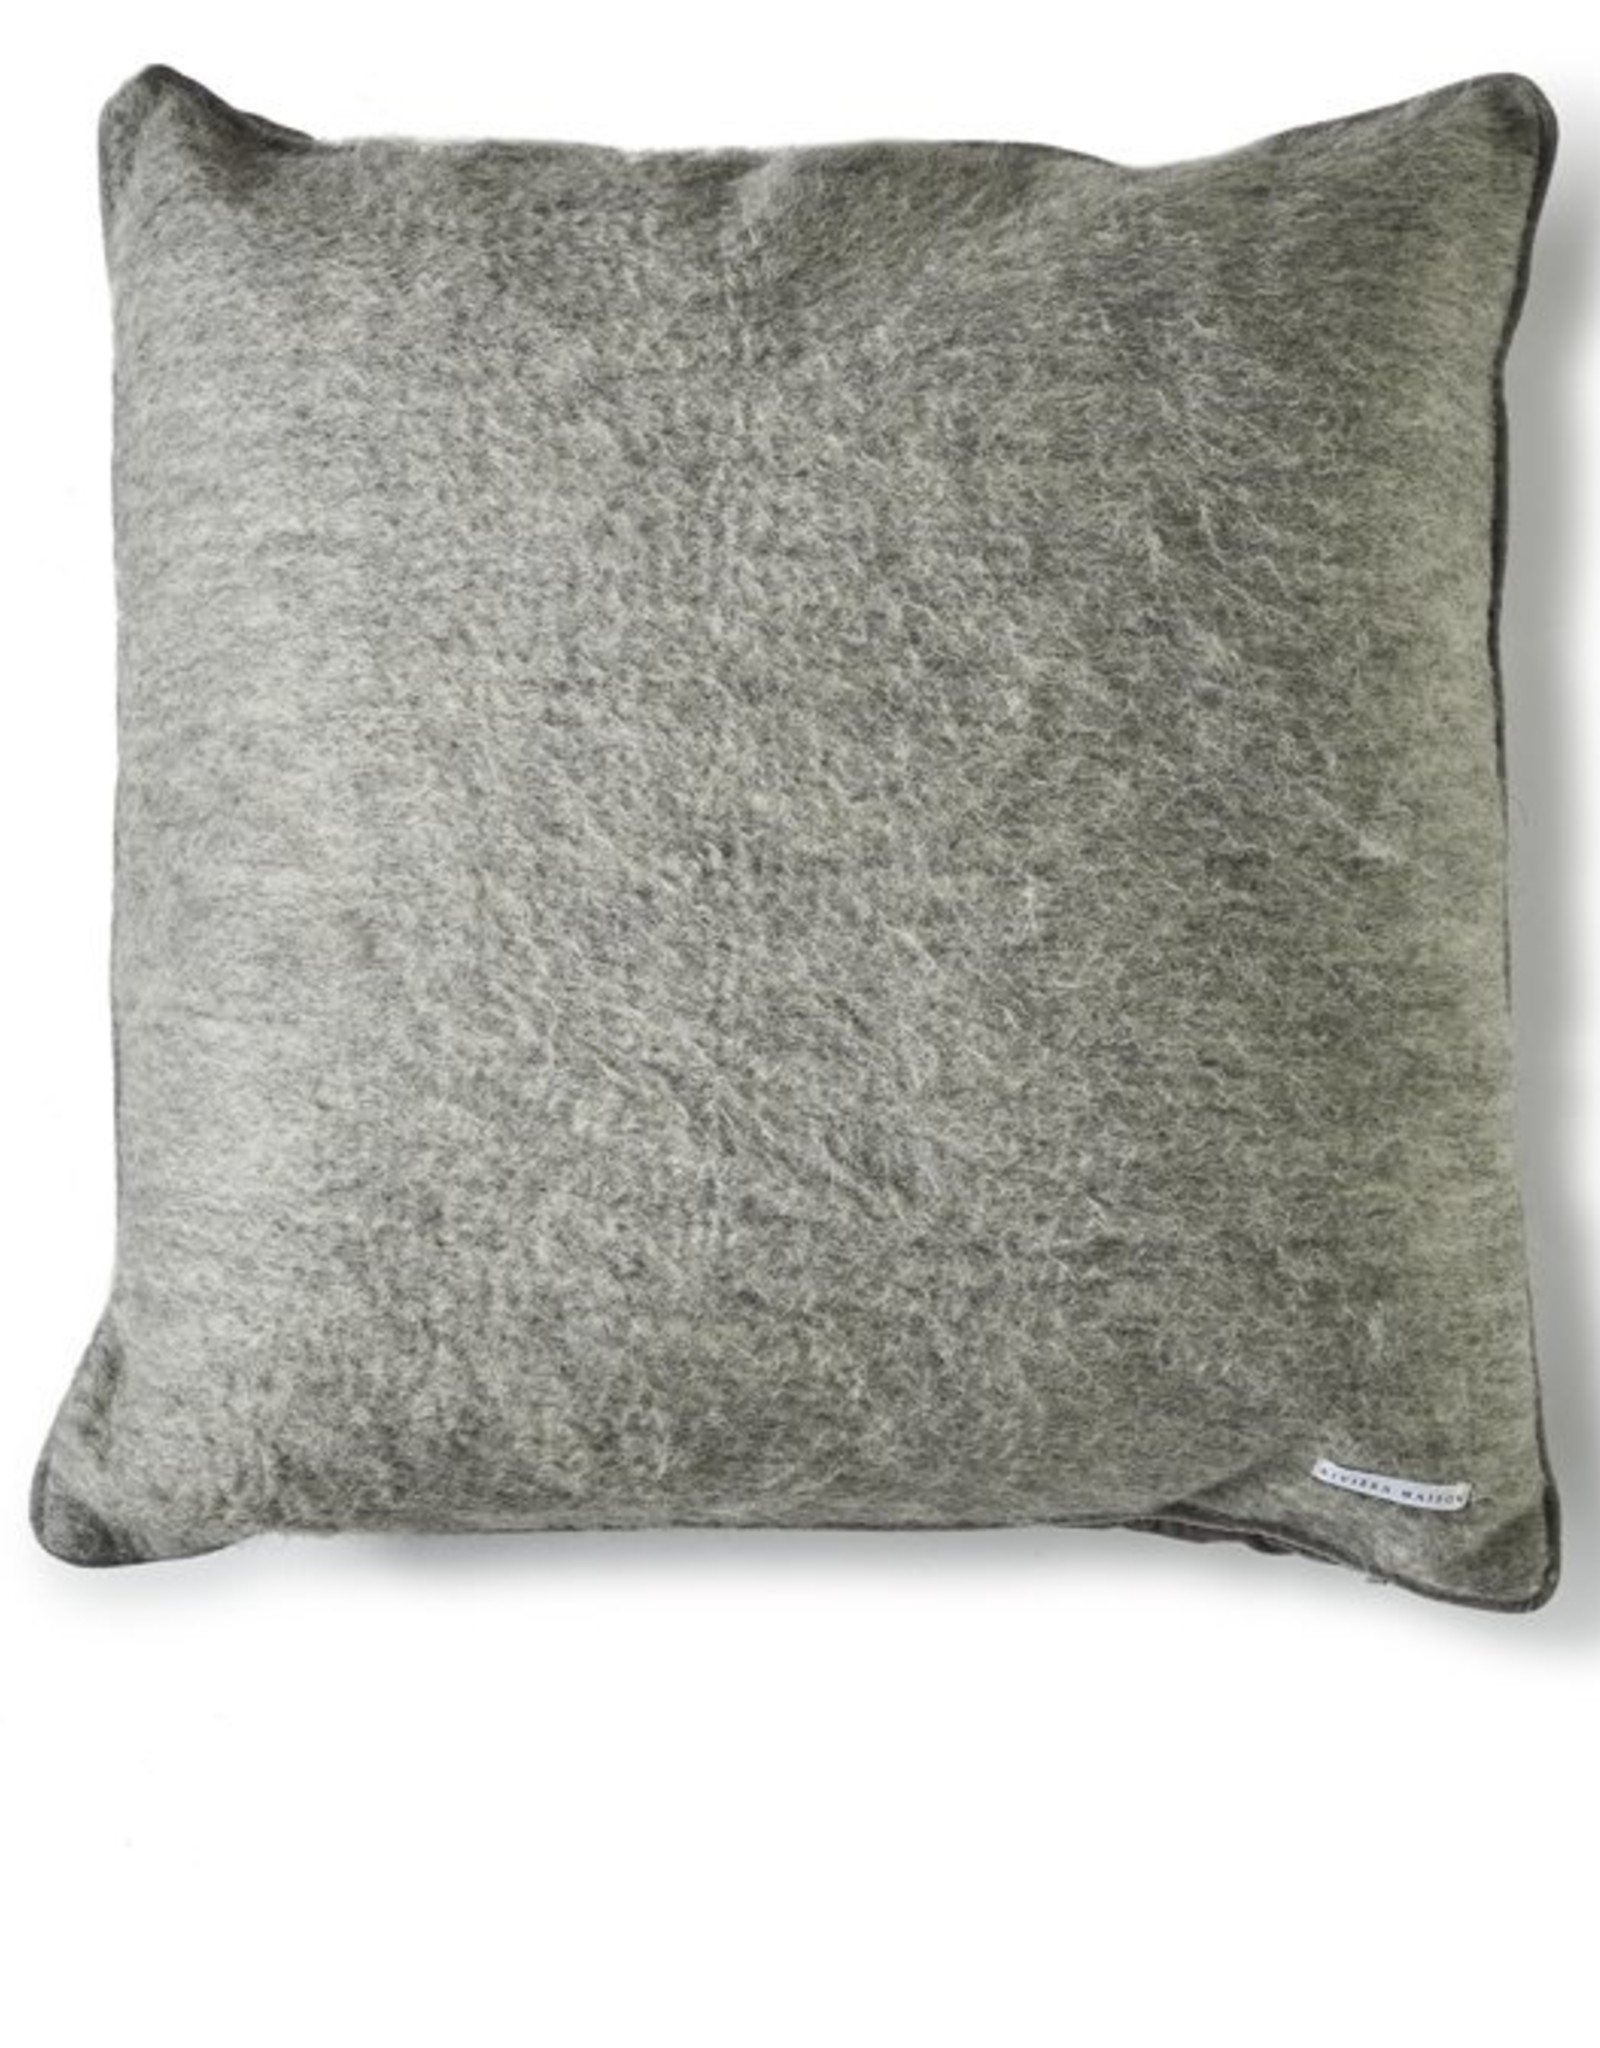 Riviera Maison Residenza cashmere Pillow